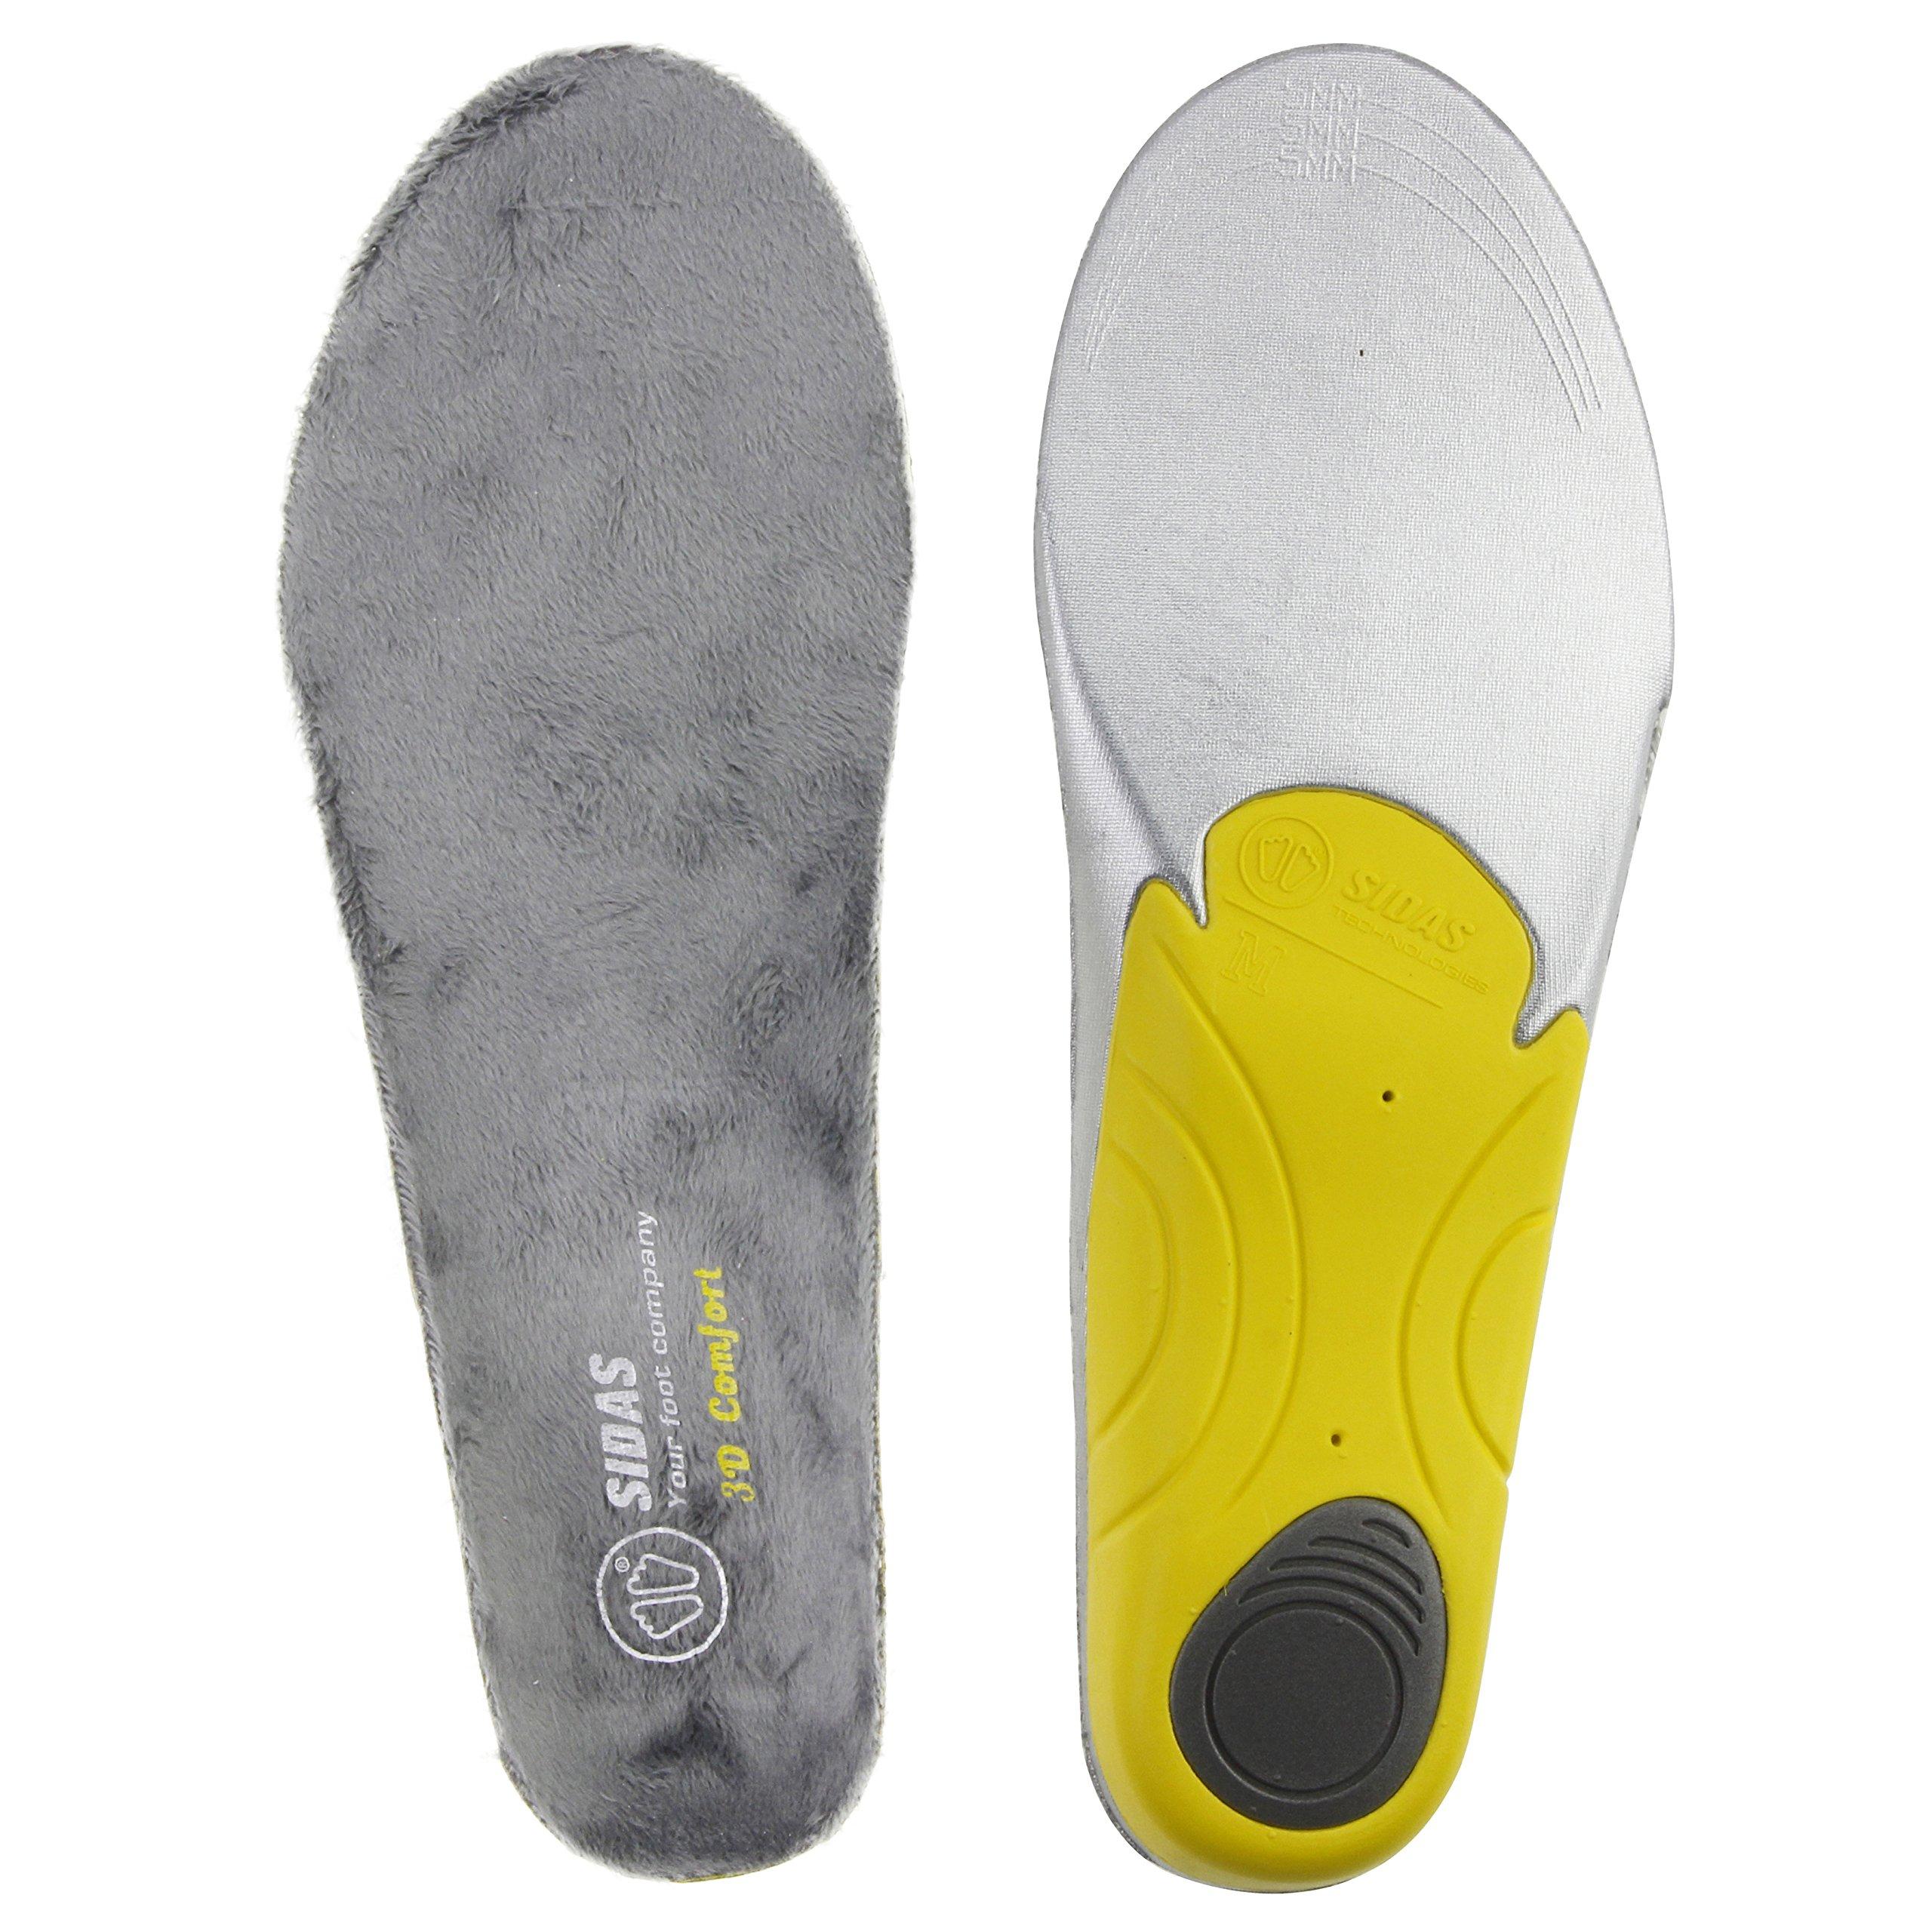 Sidas Winter 3D Comfort Sohle Ski, Gelb, L/42-43